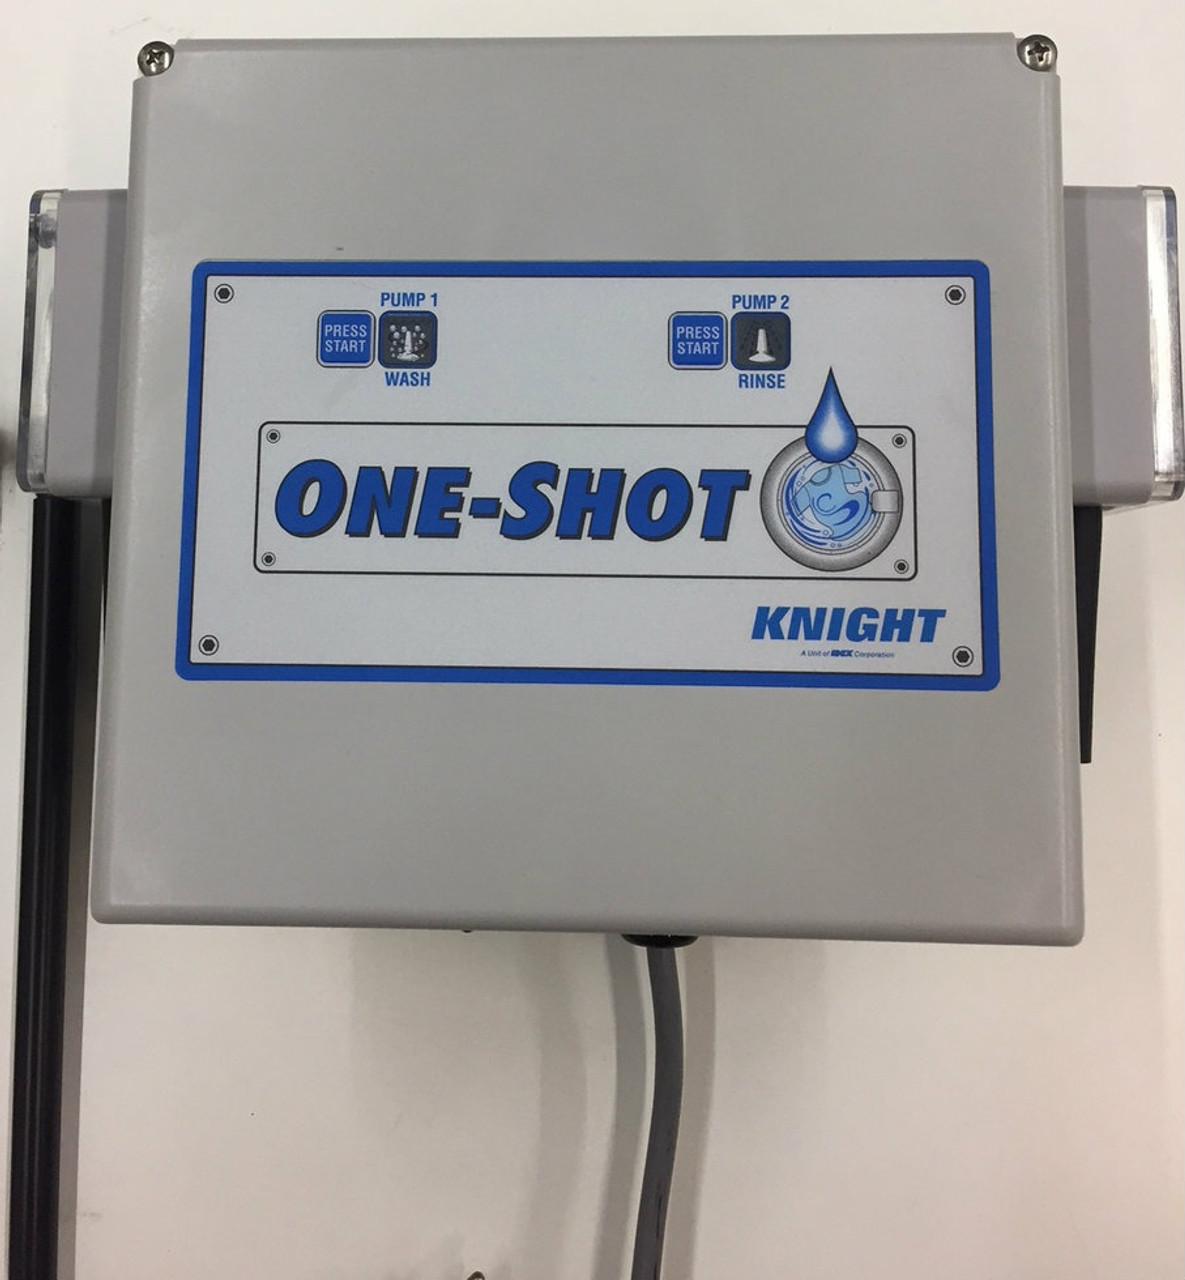 KNIGHT OS-200L ONE-SHOT Dispensing System, 2 Pumps, Internal Transformer